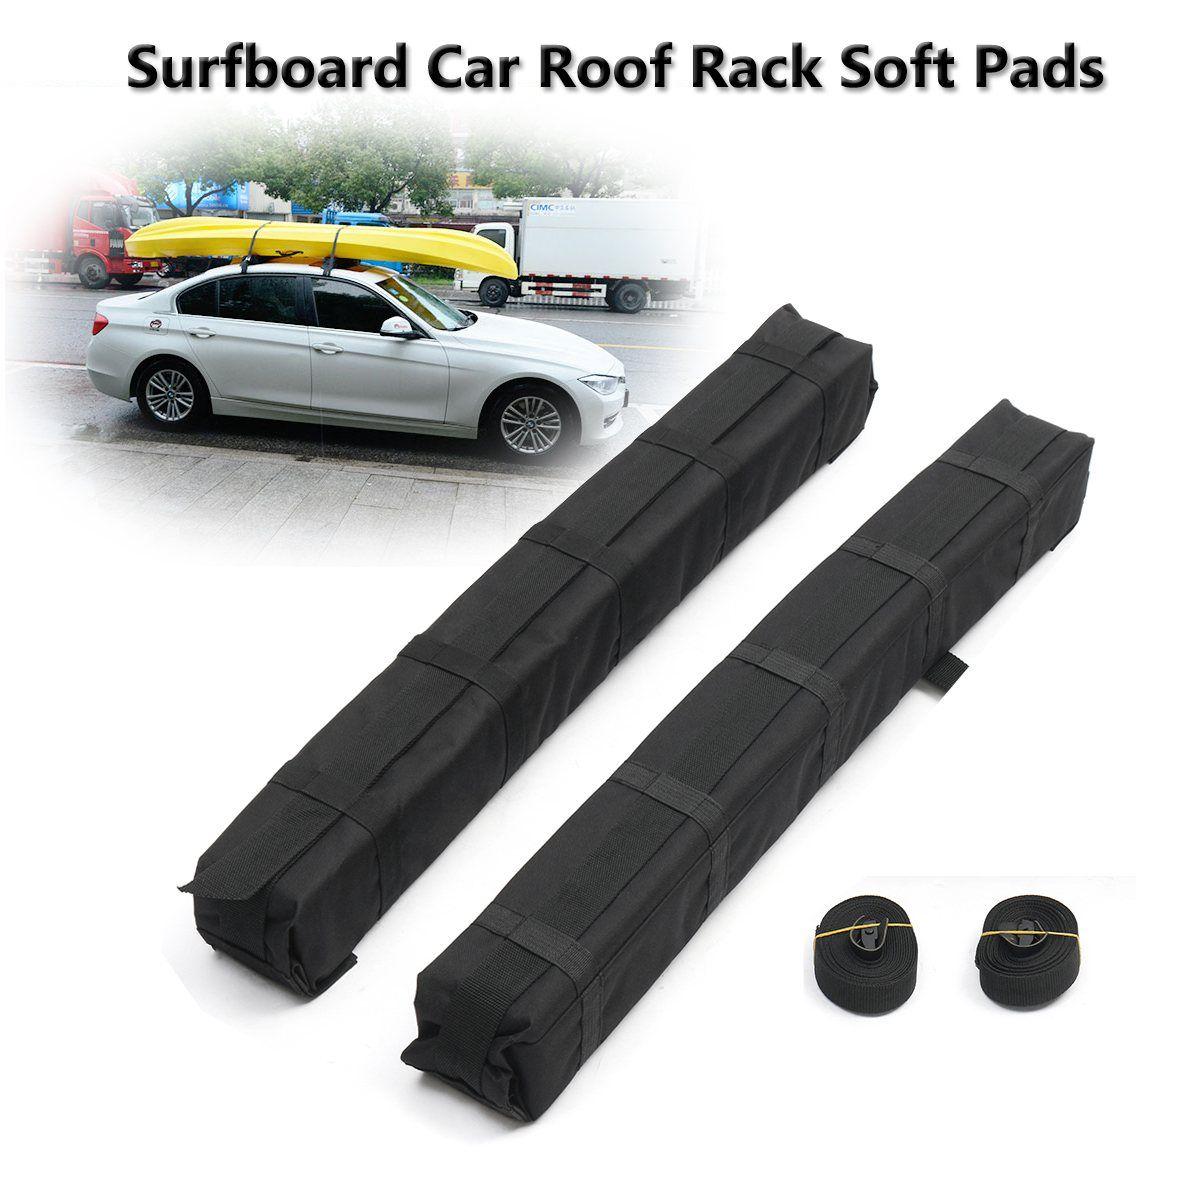 2pcs Universal Auto Soft Car Roof Rack Cross Bar Kayaks Surfboard Car Roof Rack EVA Soft Pads Outdoor Travel Luggage Carrier Bar